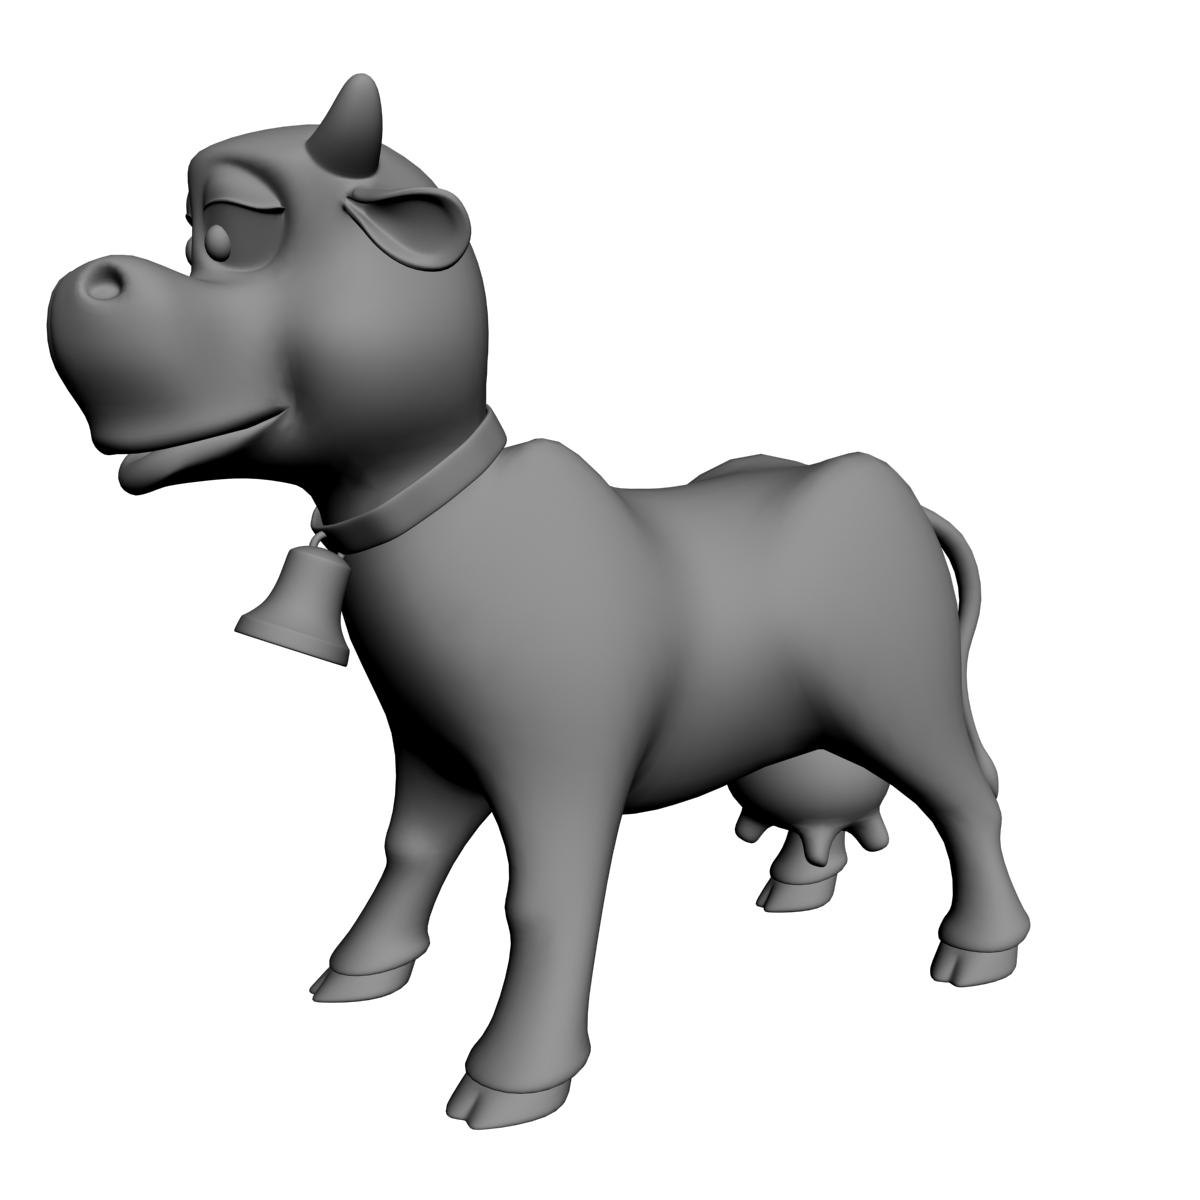 cartoon cow rigged 3d model 3ds max fbx  obj 166112